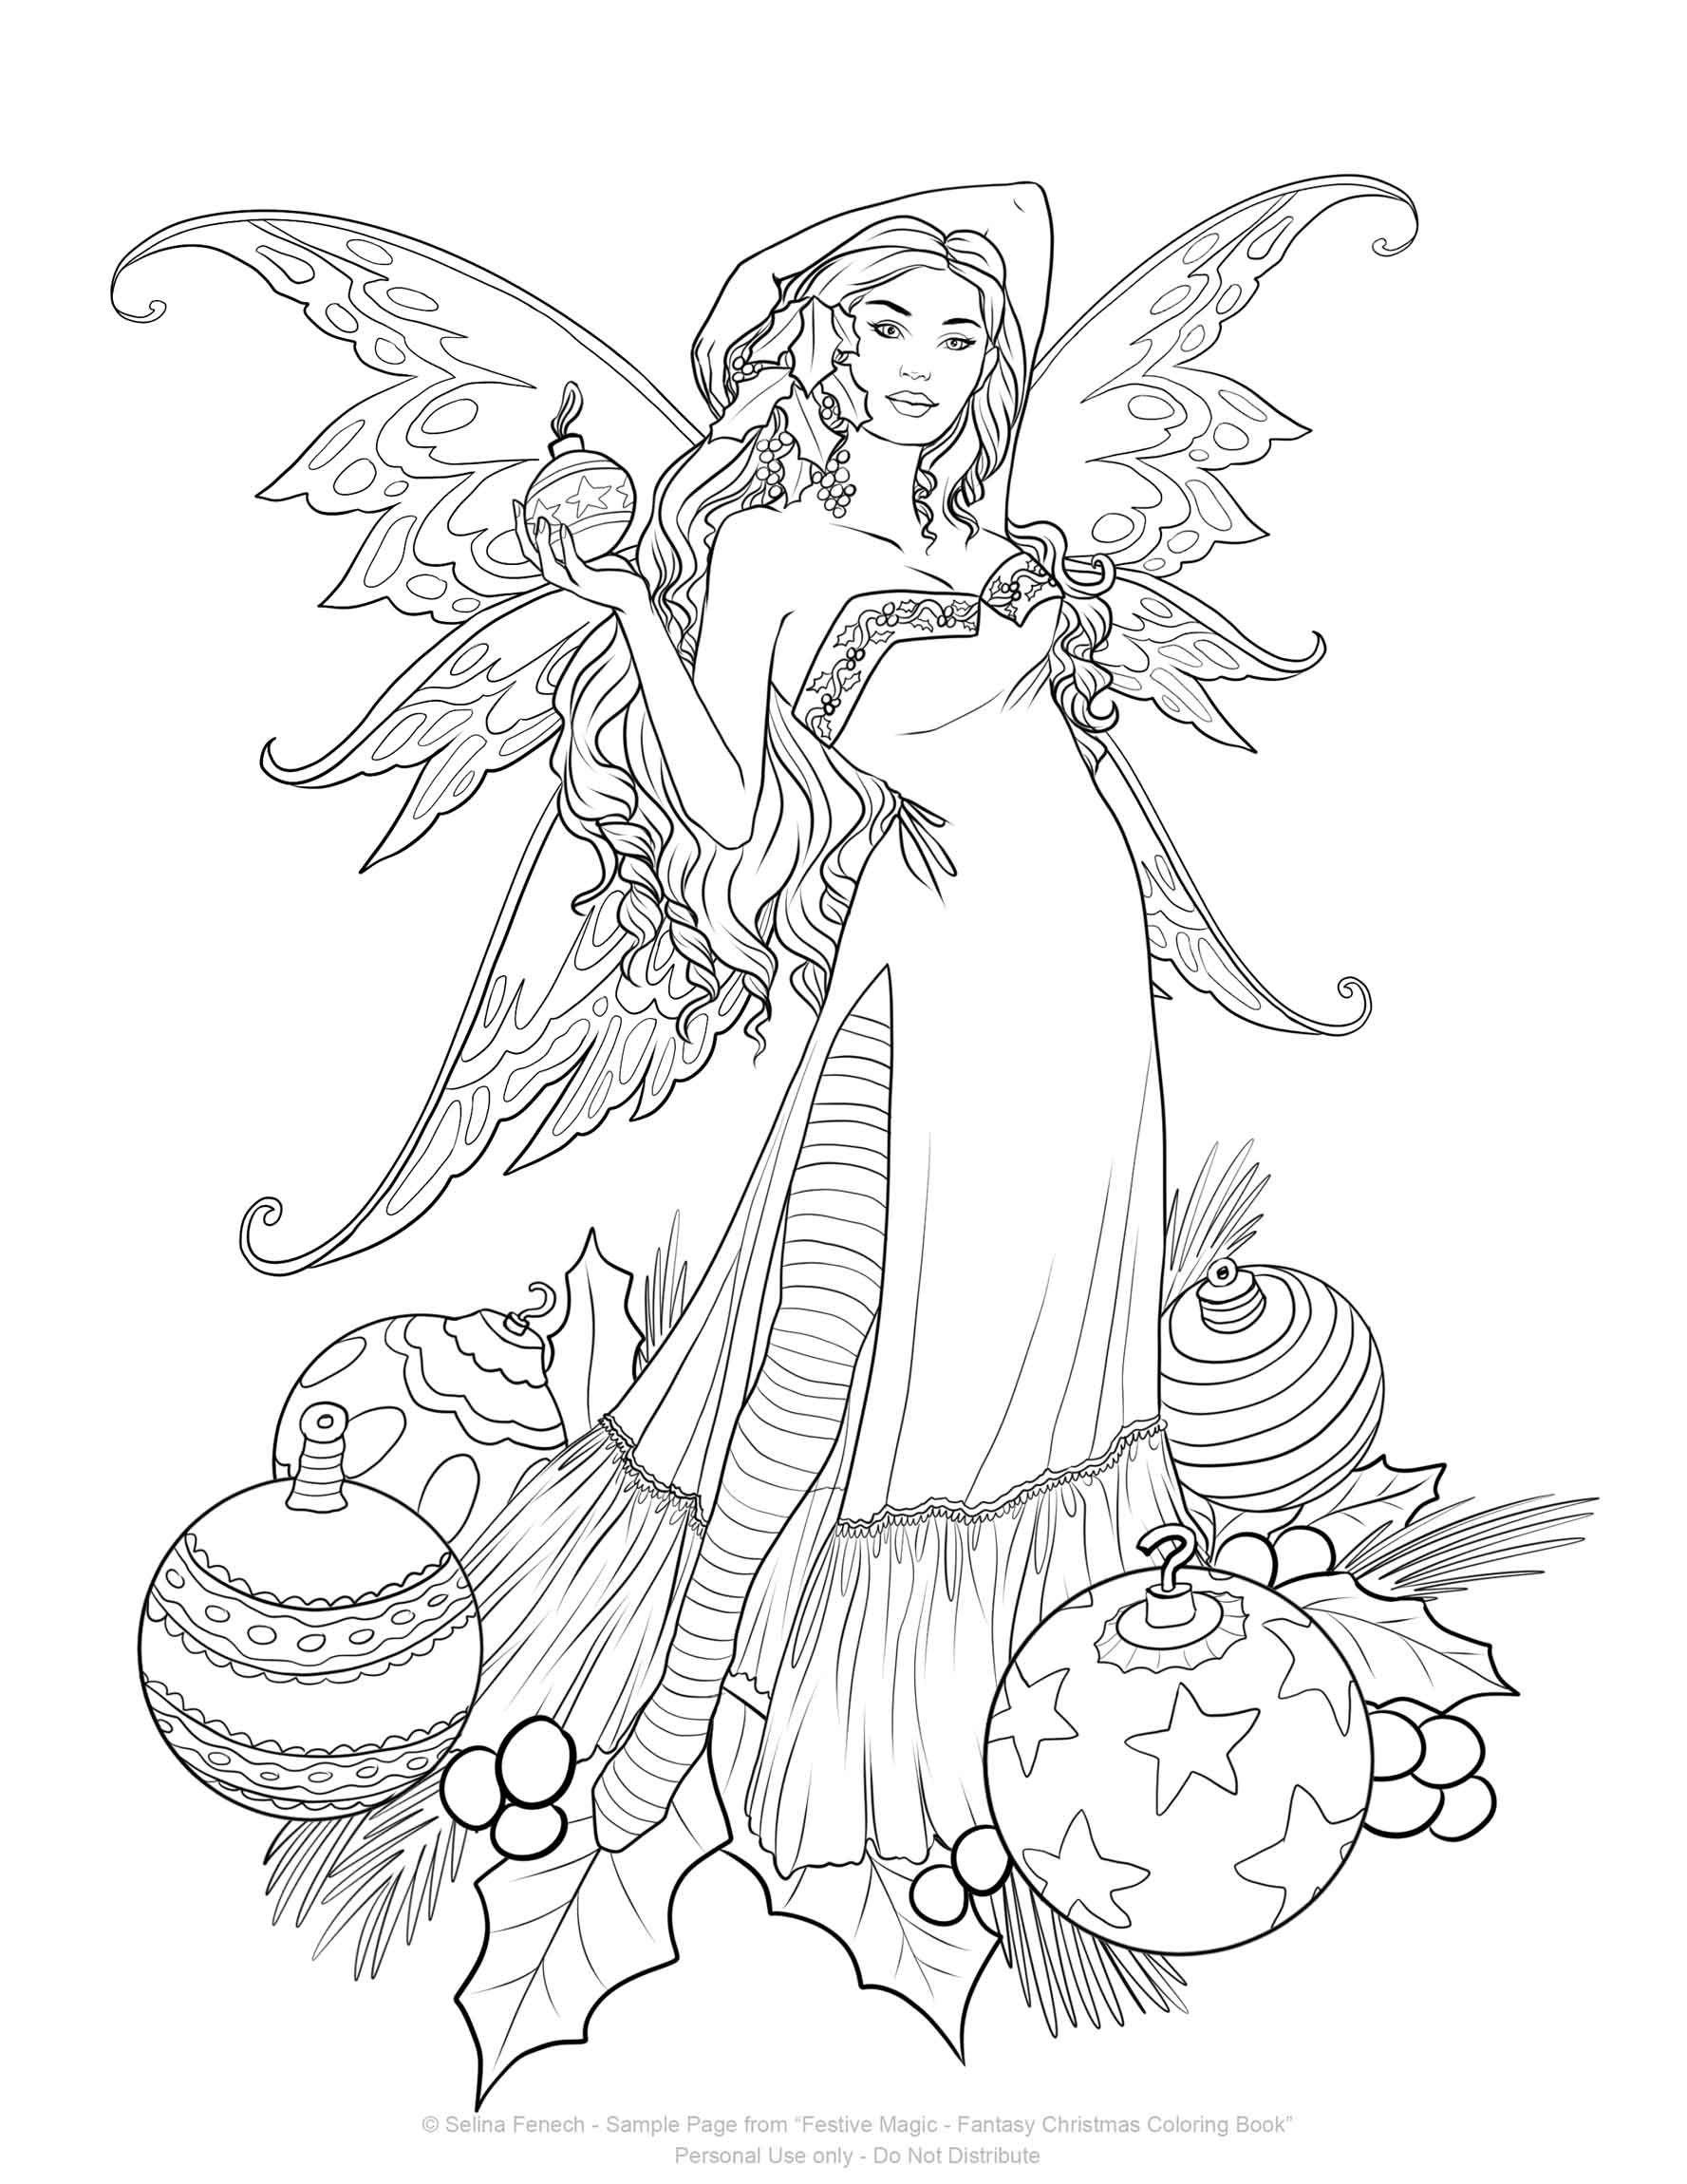 image result for selina fenech festive magic fantasy christmas coloring images selena fenech. Black Bedroom Furniture Sets. Home Design Ideas